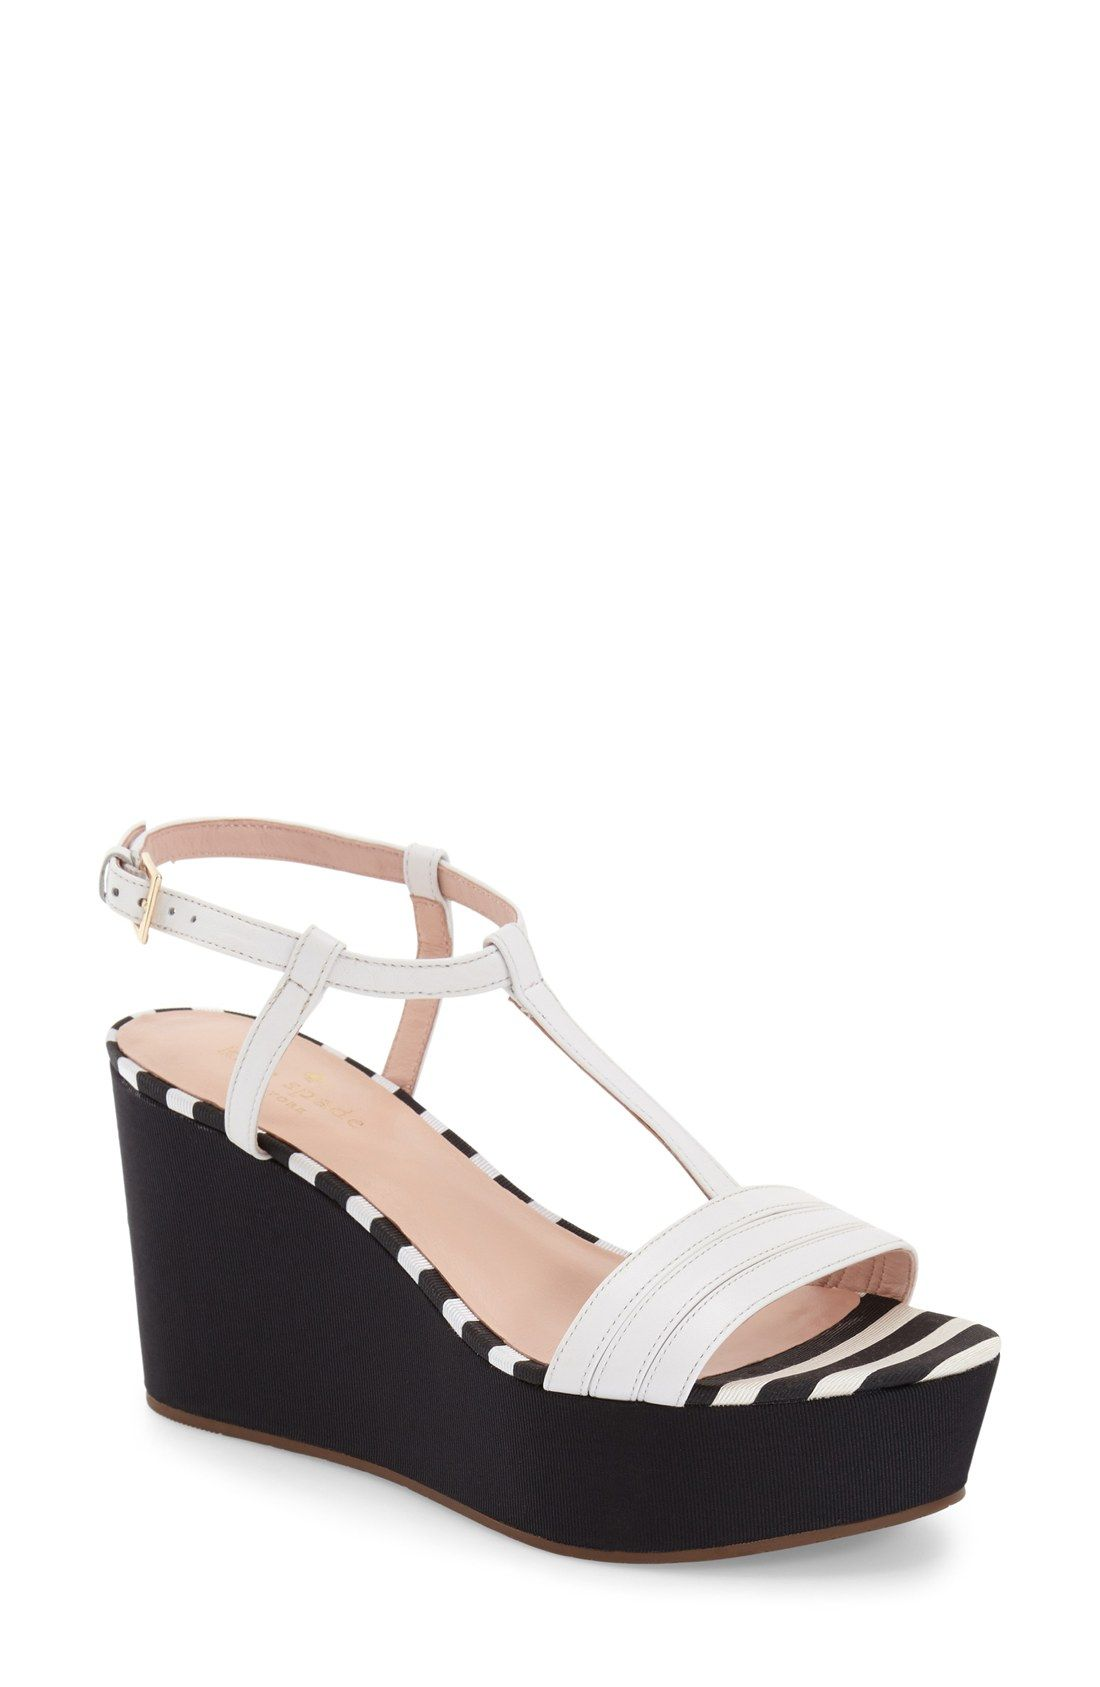 4b5e7ca036a kate spade new york  tallin  wedge sandal (Women)